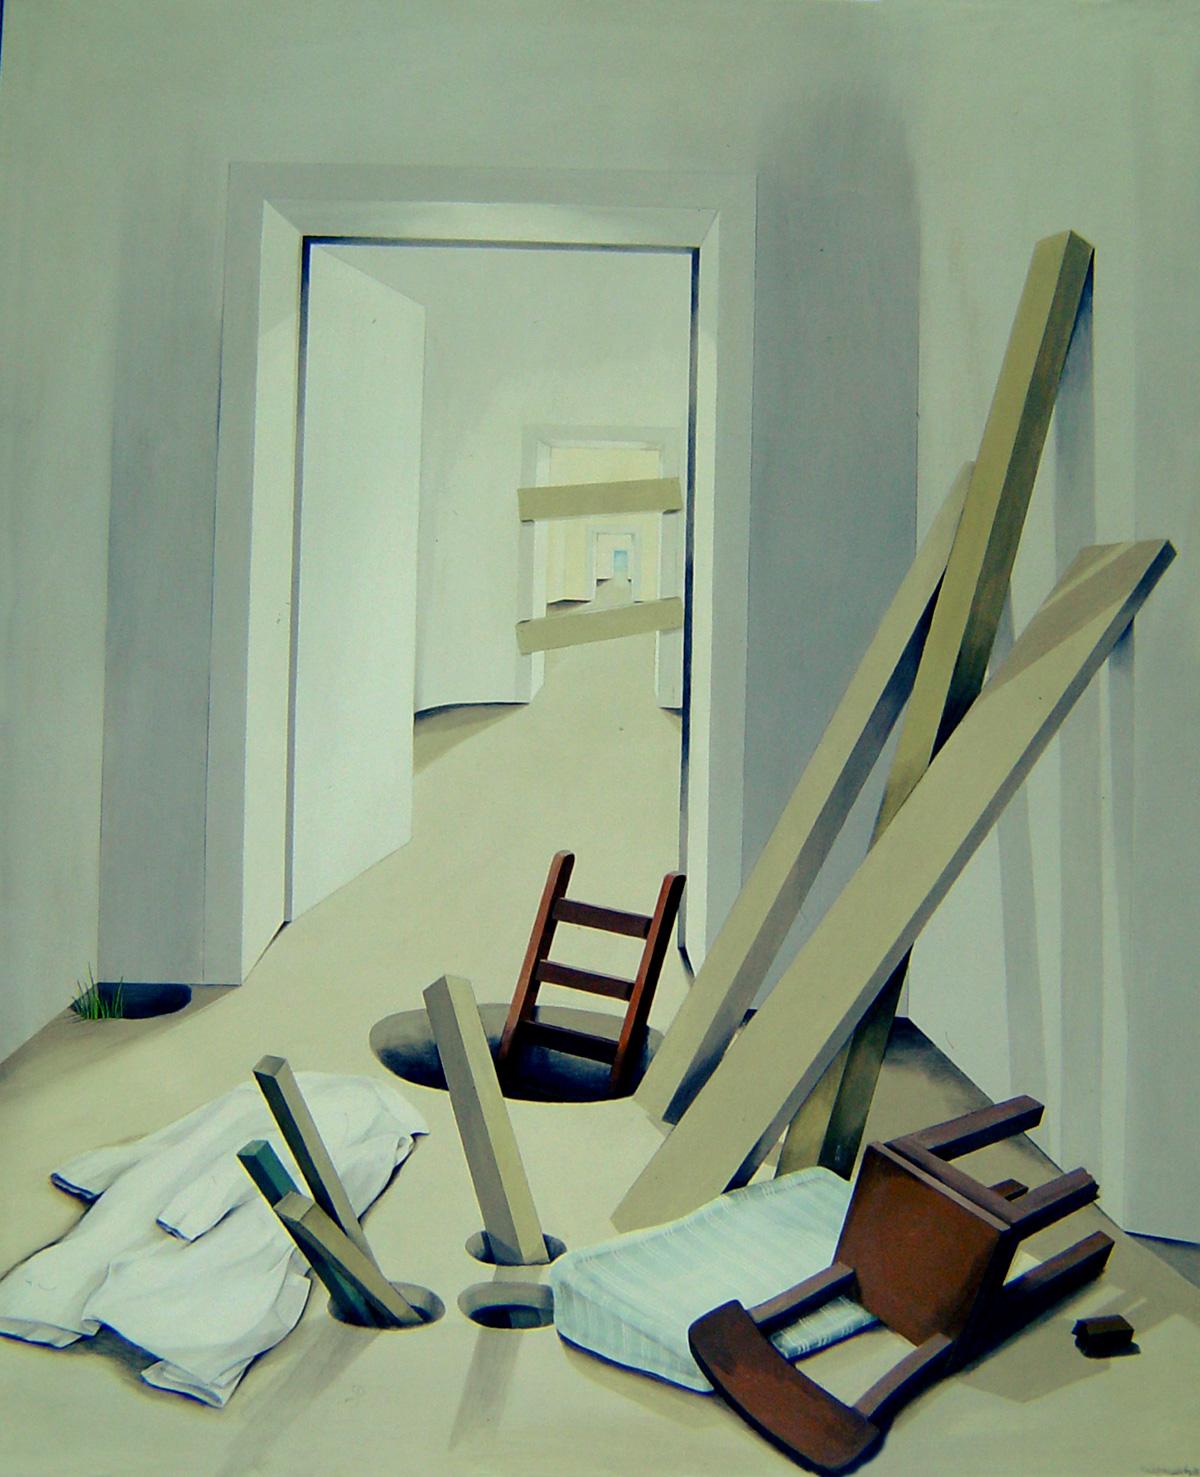 renate sautermeister 1975 77 r ume. Black Bedroom Furniture Sets. Home Design Ideas